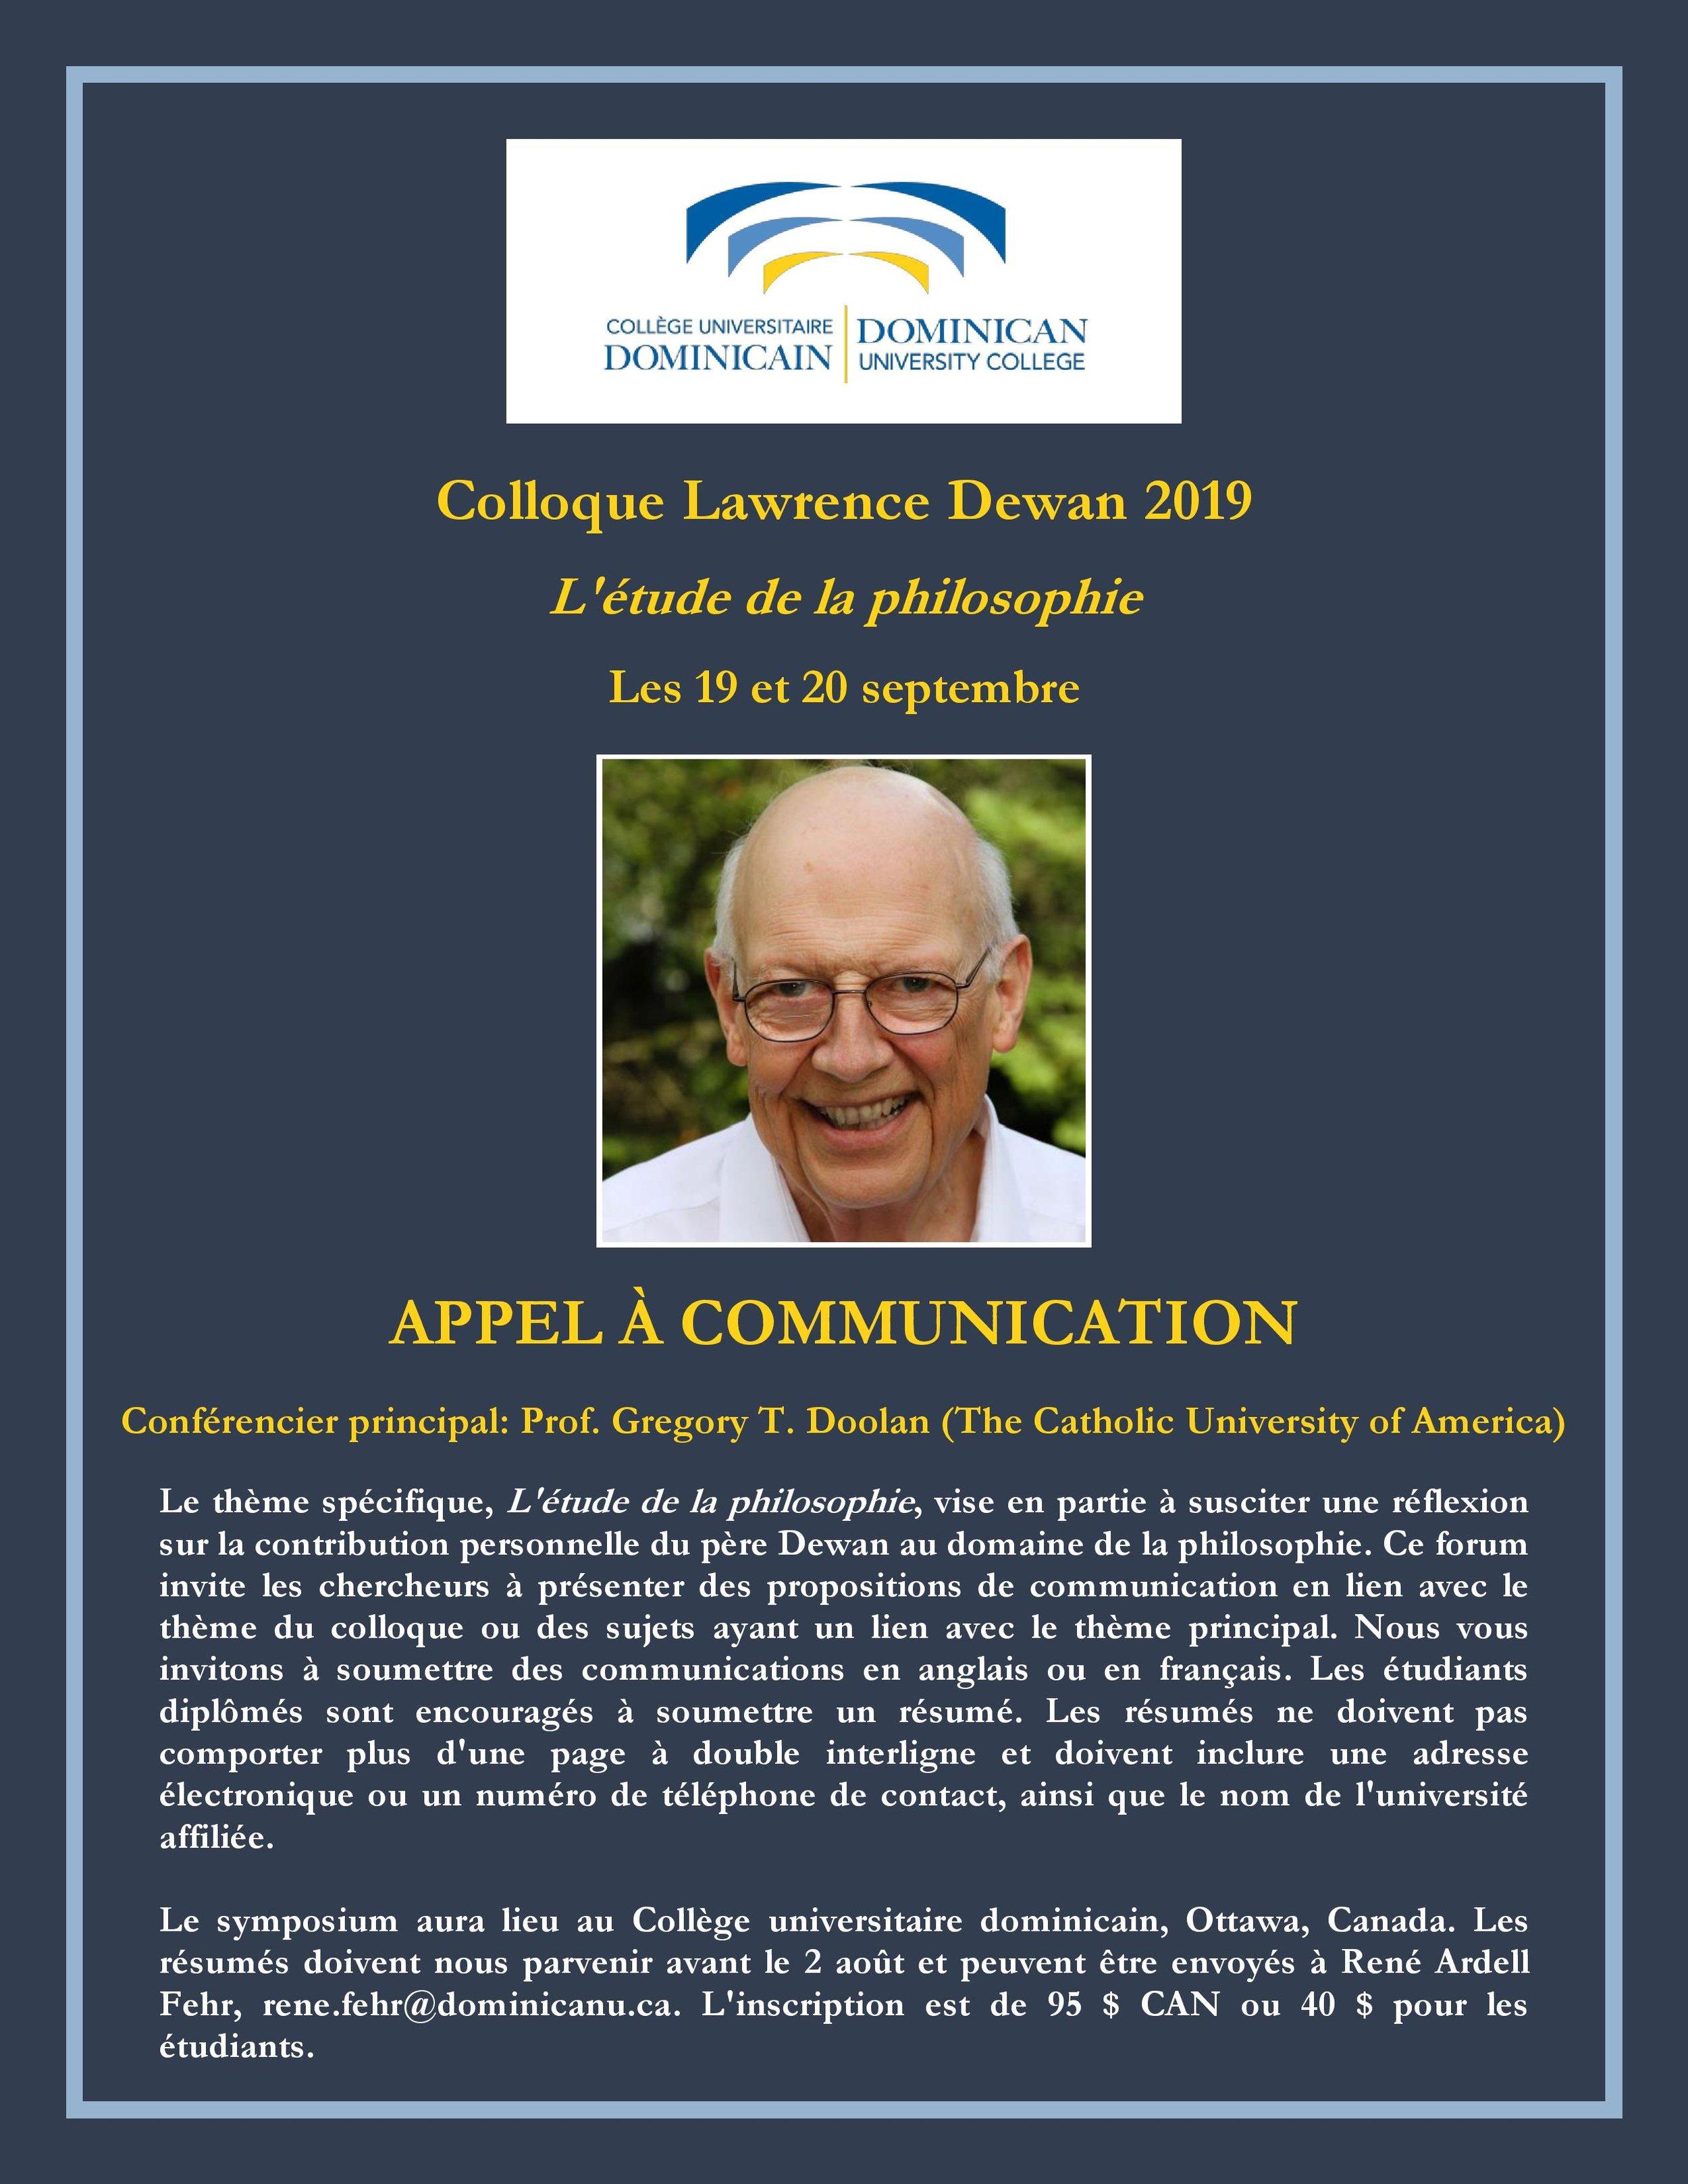 2019 Colloque Dewan Francais-page-001.jpg